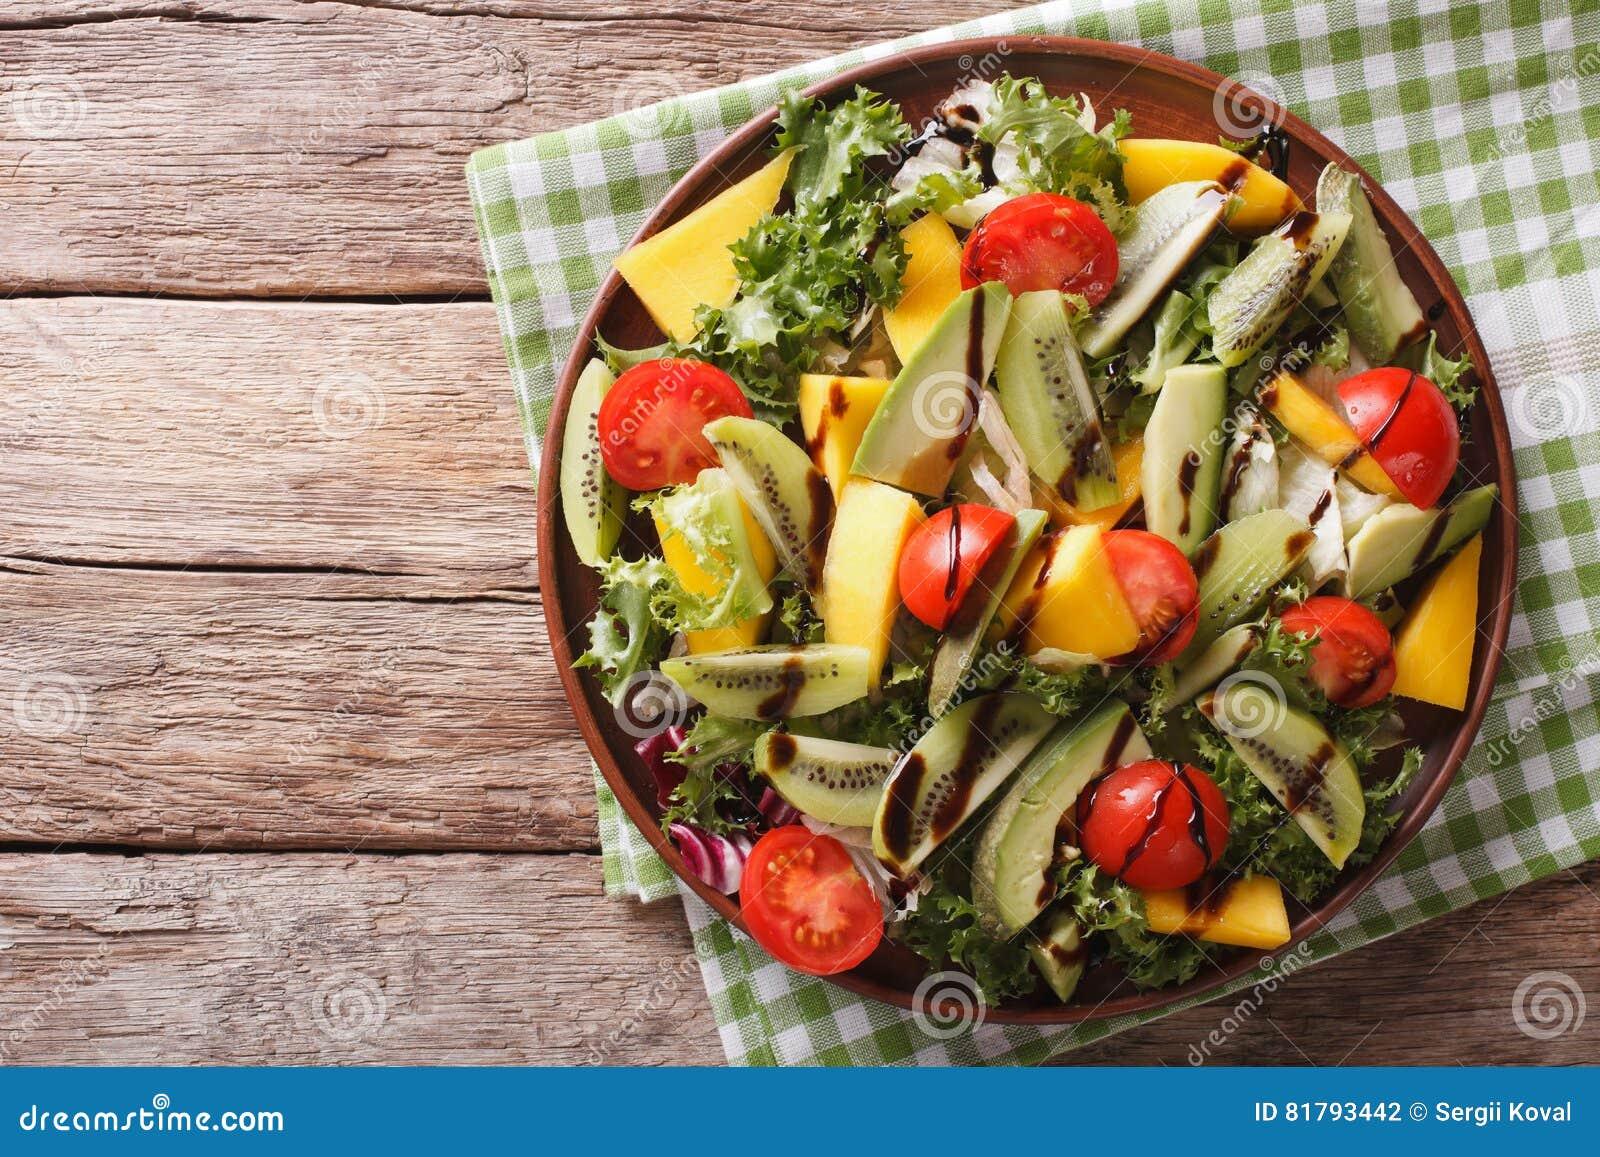 Salad Of Mango Avocado Kiwi Lettuce Tomato Dressed With Bals